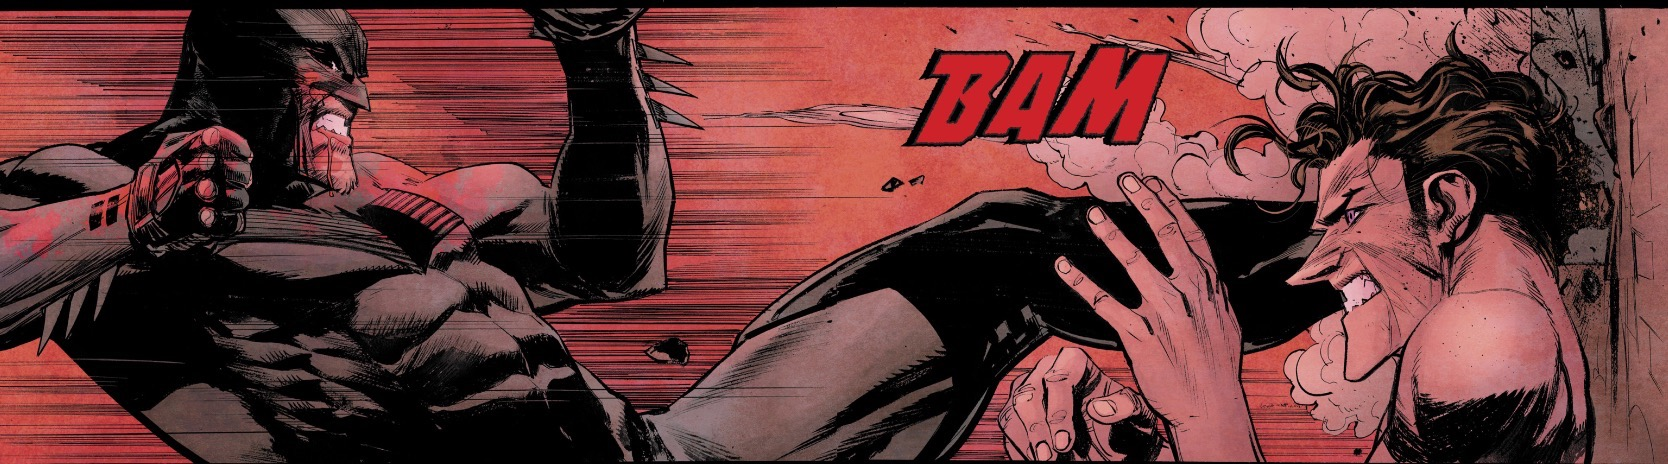 Batman: White Knight  #6 by Sean Gordon Murphy and Matt Hollingsworth